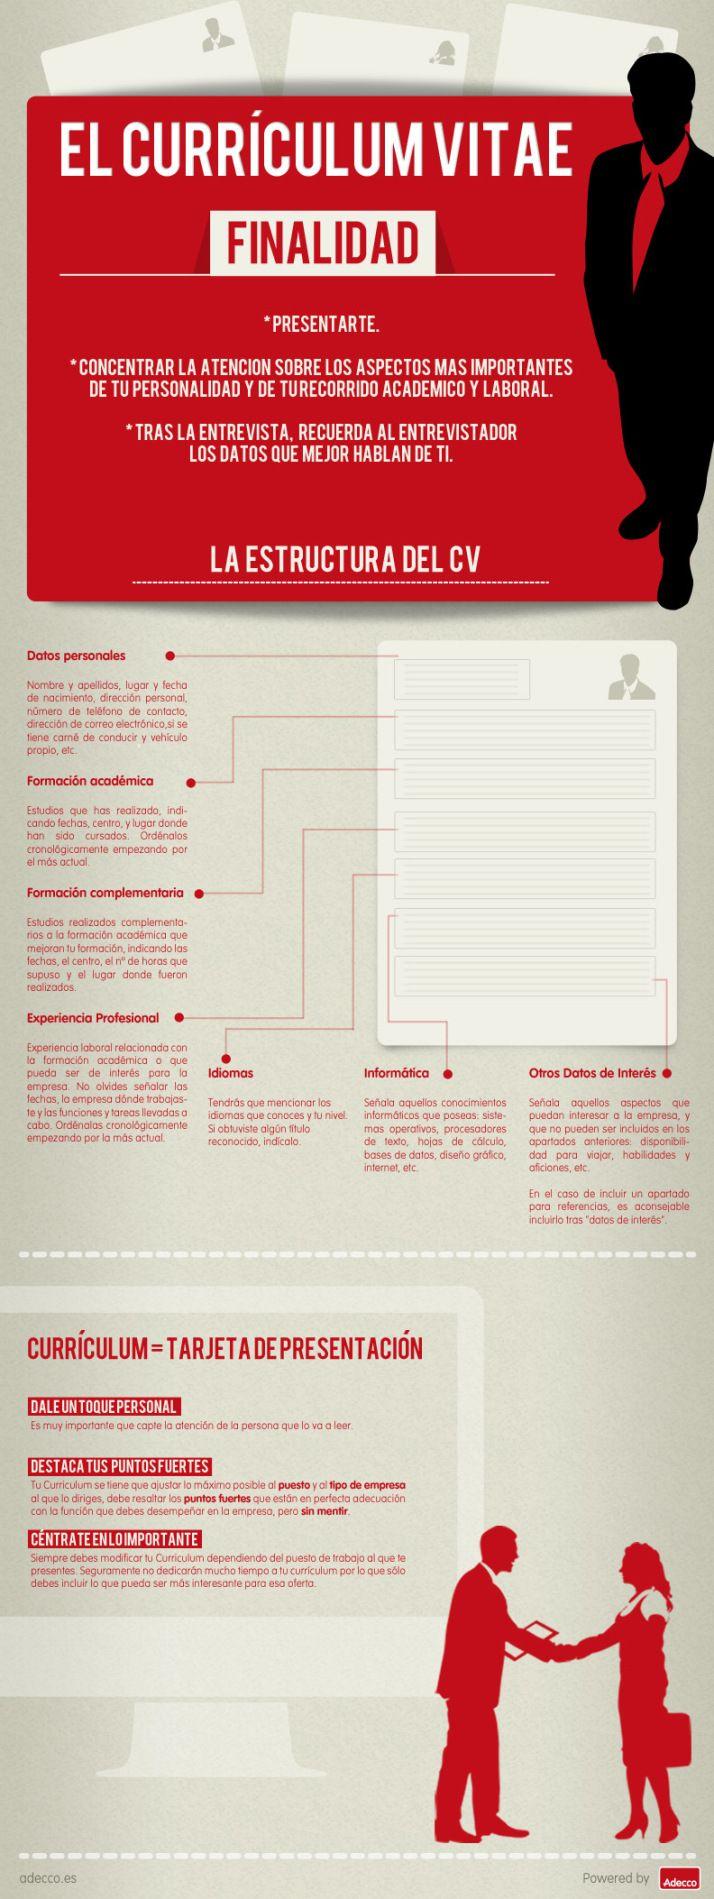 c u00f3mo hacer bien un curriculum vitae  infografia  infographic